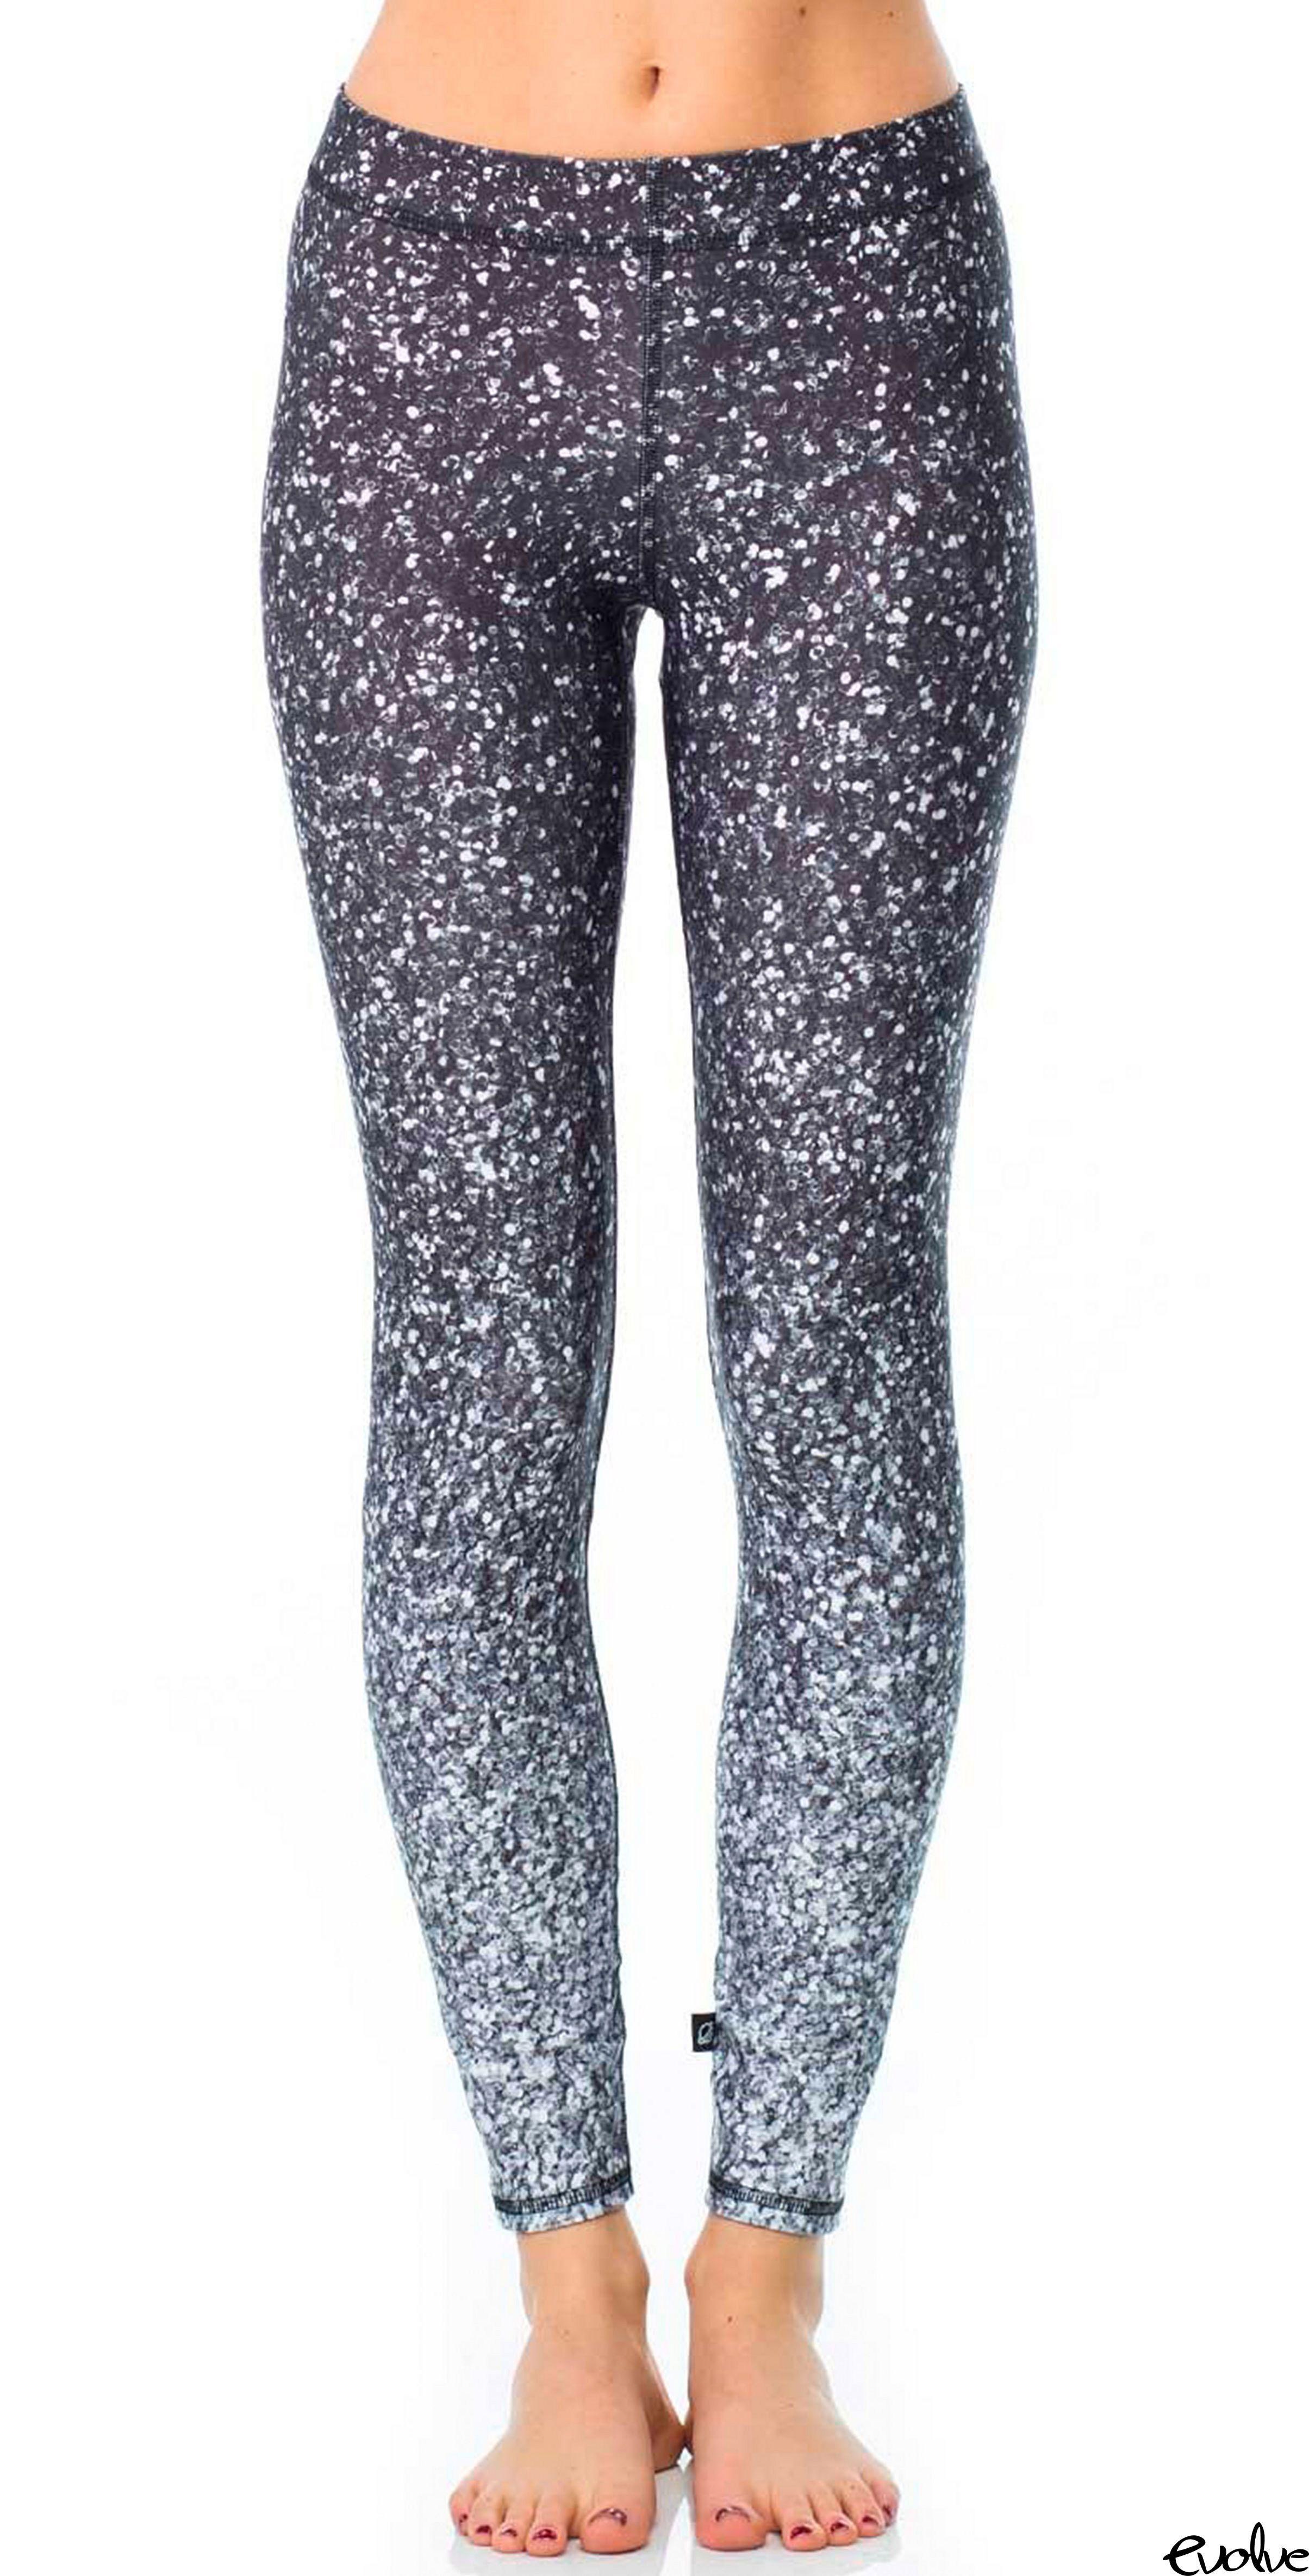 Pin By Brandi Bidegain On Fashionmakeuphair Glitter Leggings Glitter Fashion Glitter Outfi